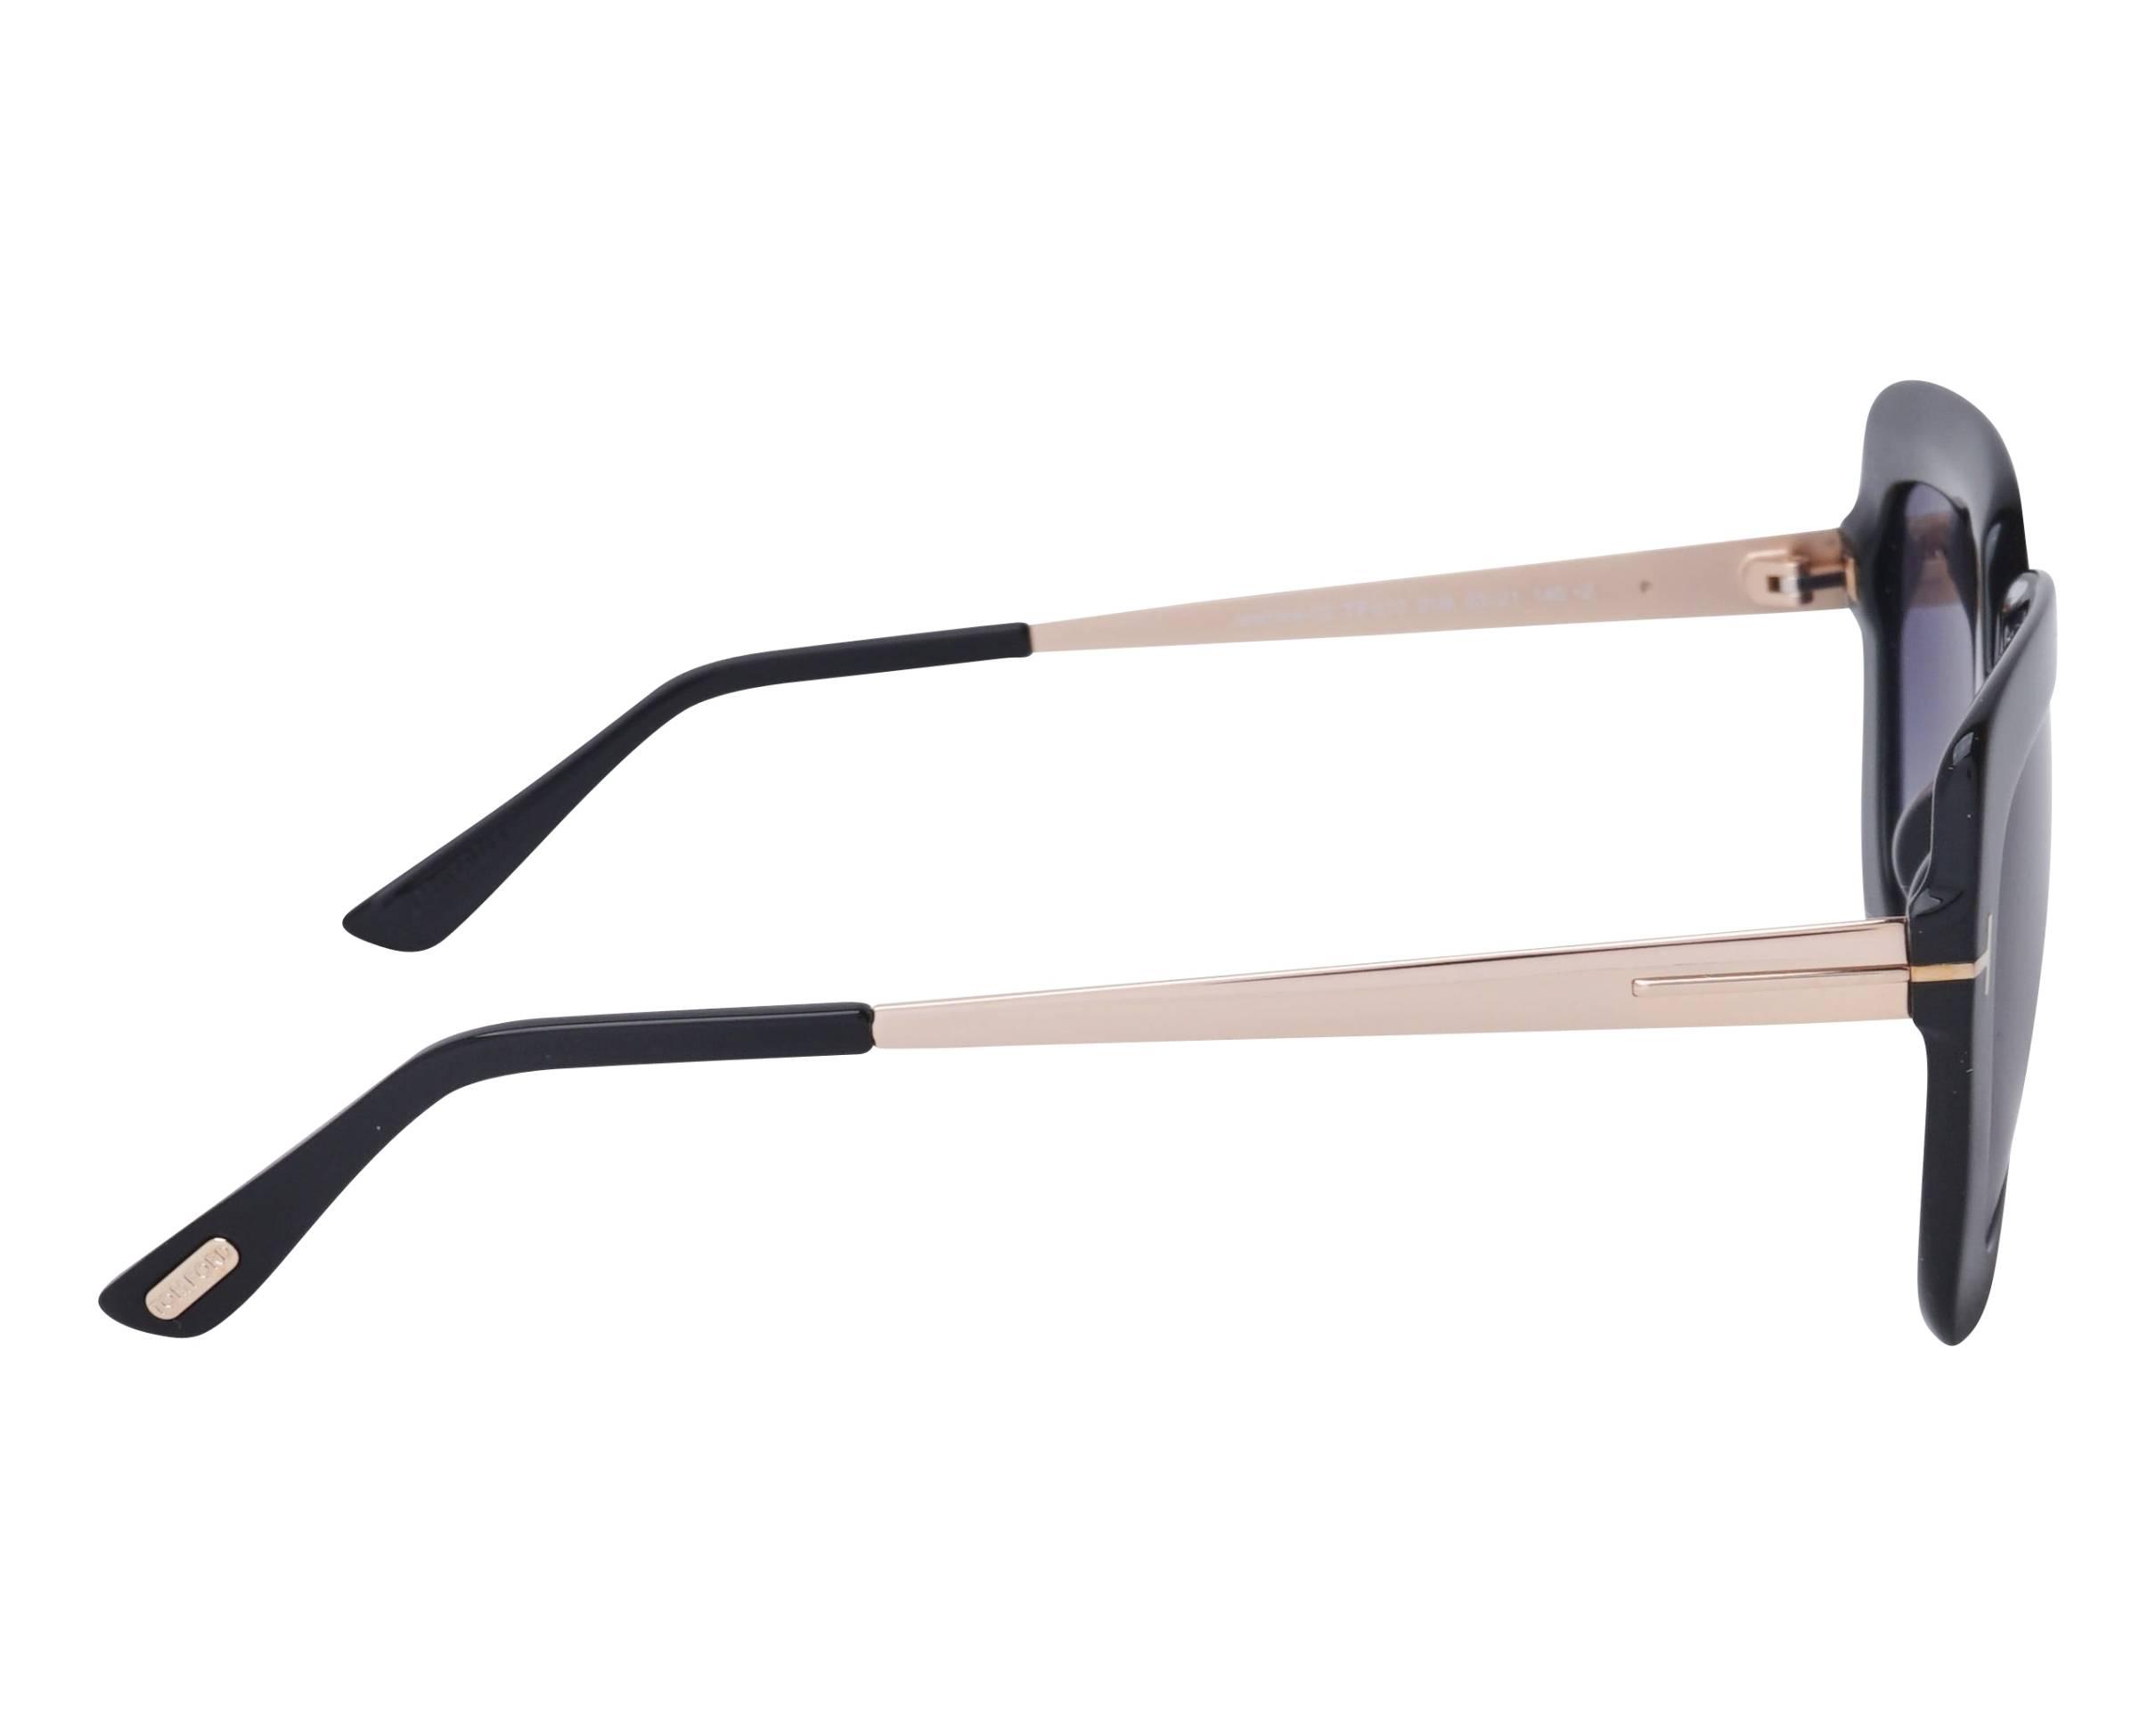 68f669ec5d Sunglasses Tom Ford TF-0610 01B 53-21 Black Gold side view